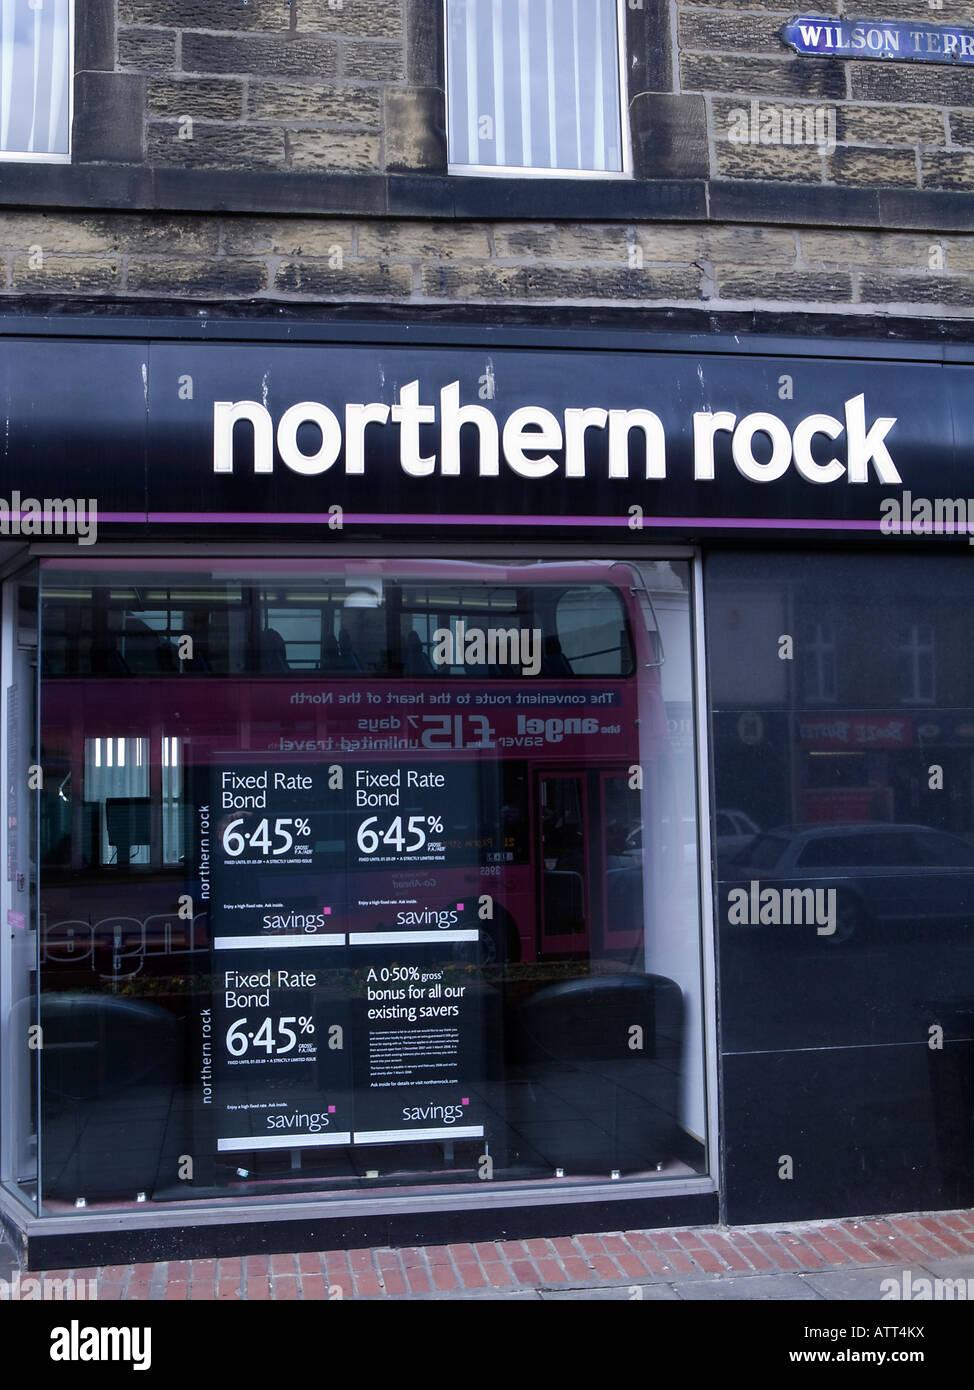 Northern Rock Bank branch displaying interest rates - Stock Image